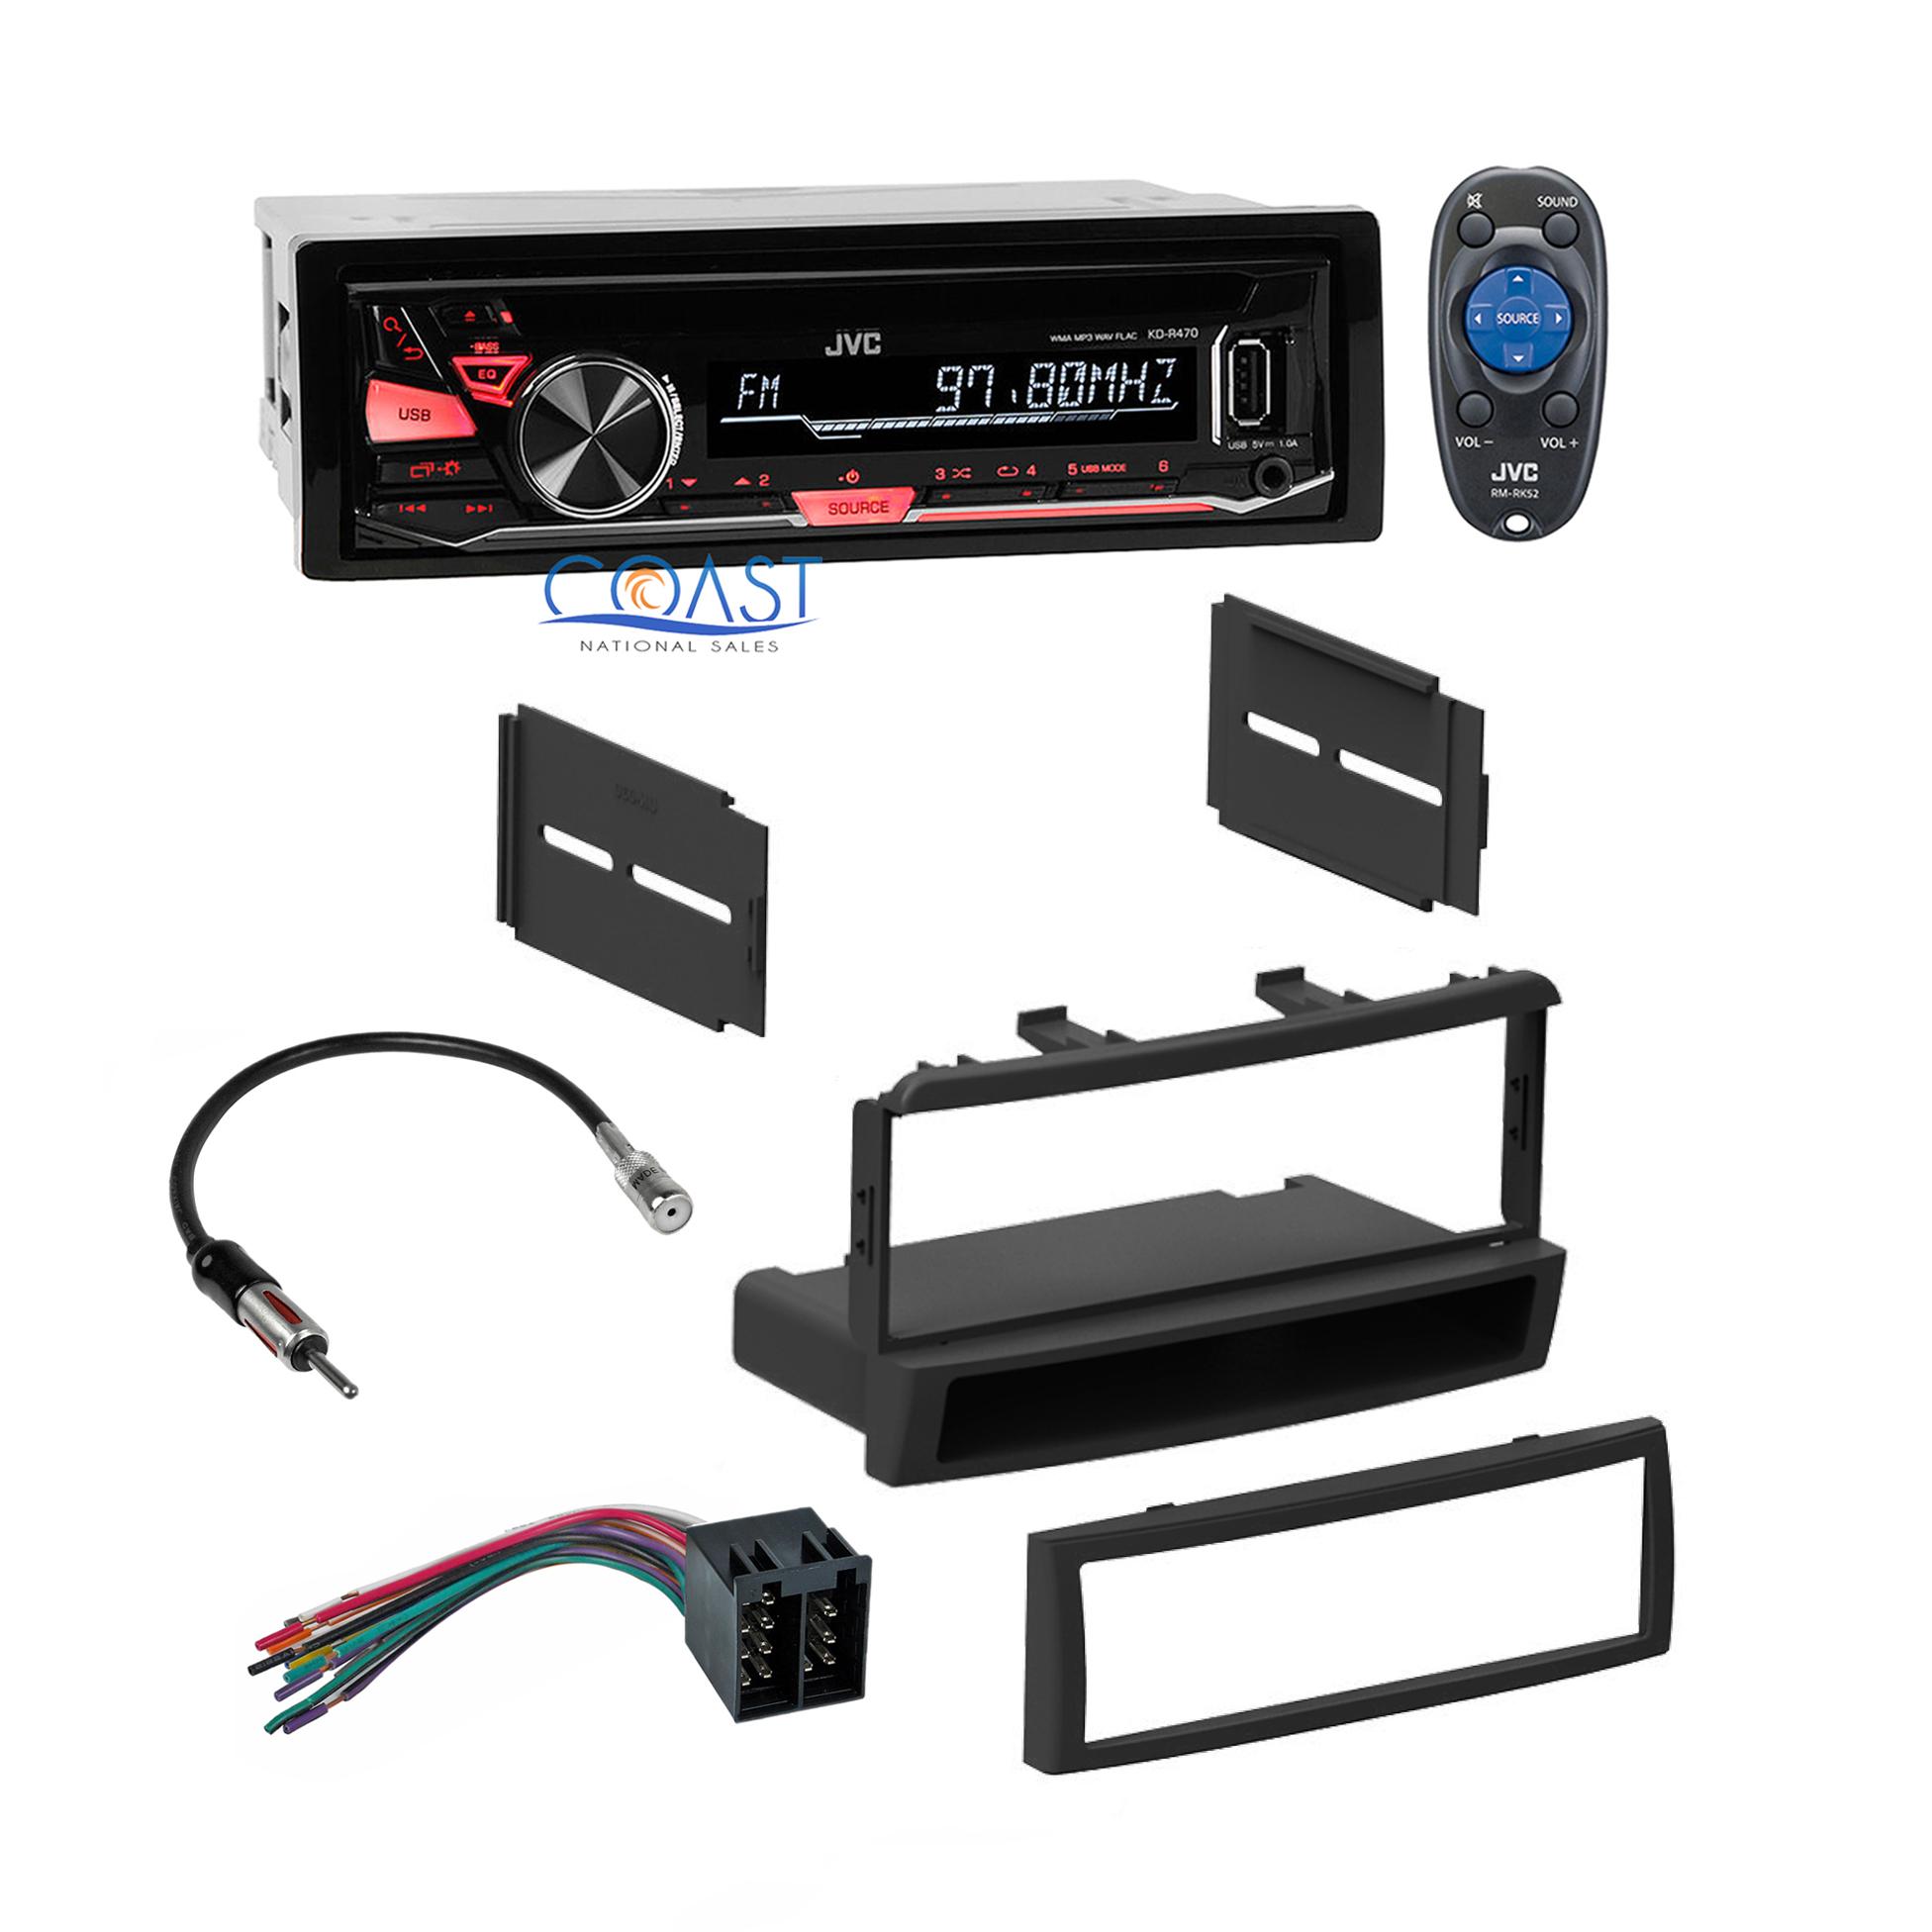 jvc car usb radio stereo dash kit harness antenna for. Black Bedroom Furniture Sets. Home Design Ideas